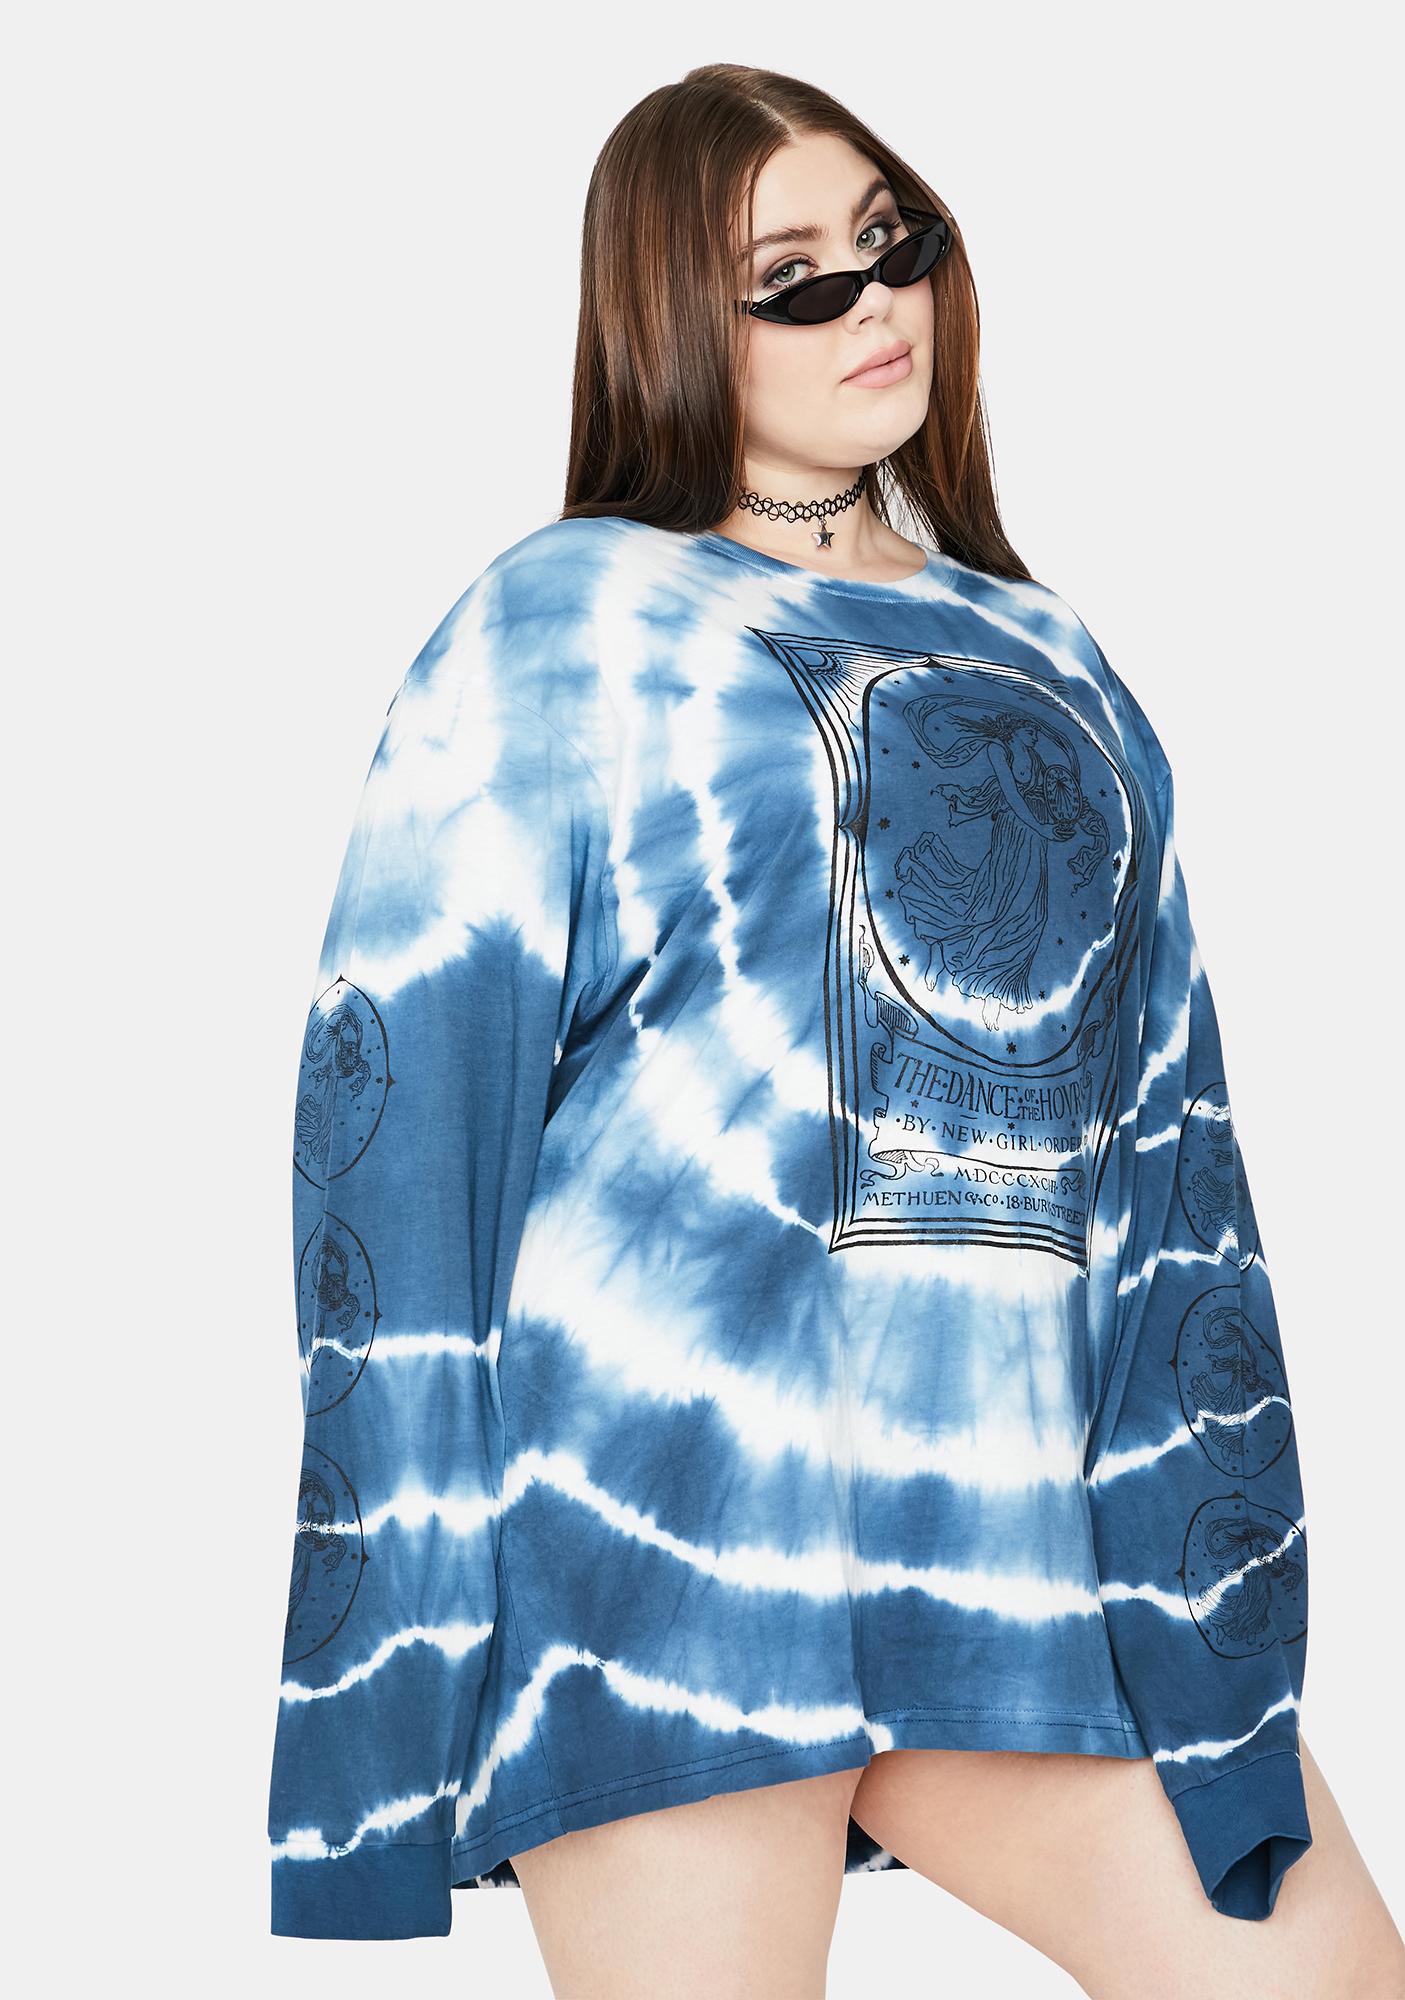 NEW GIRL ORDER Curve Opera Lady Tie Dye Tee